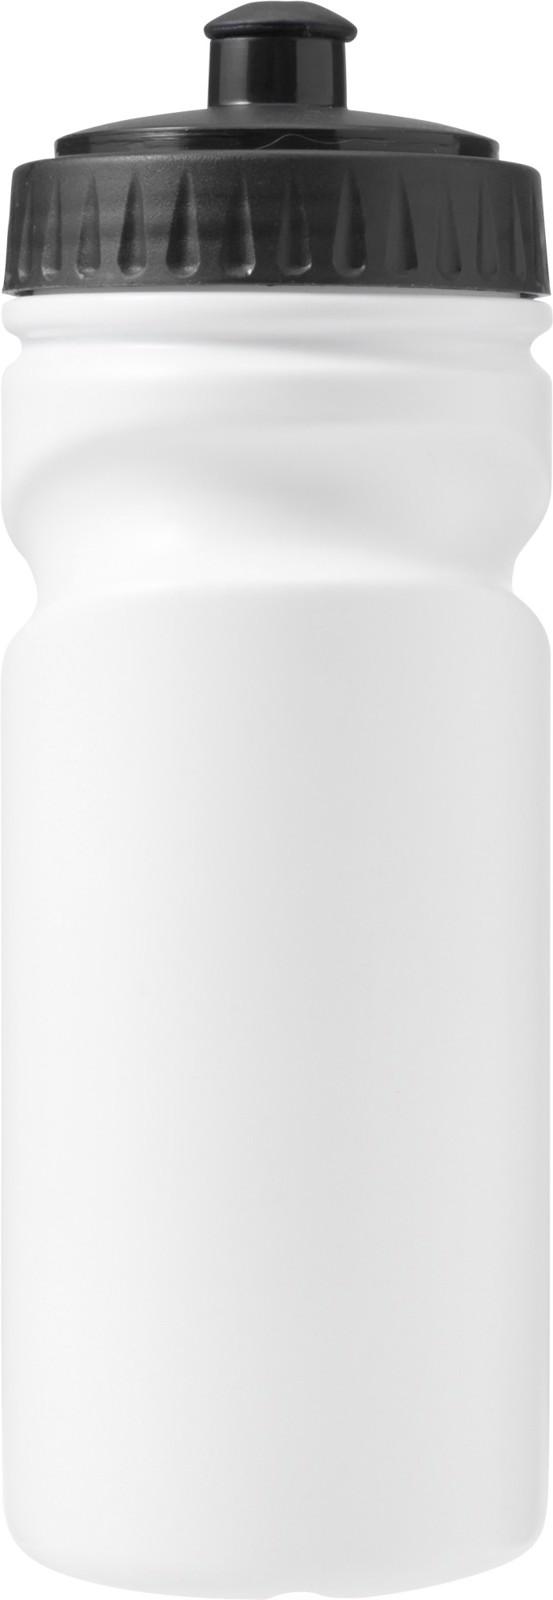 HDPE bottle - Black